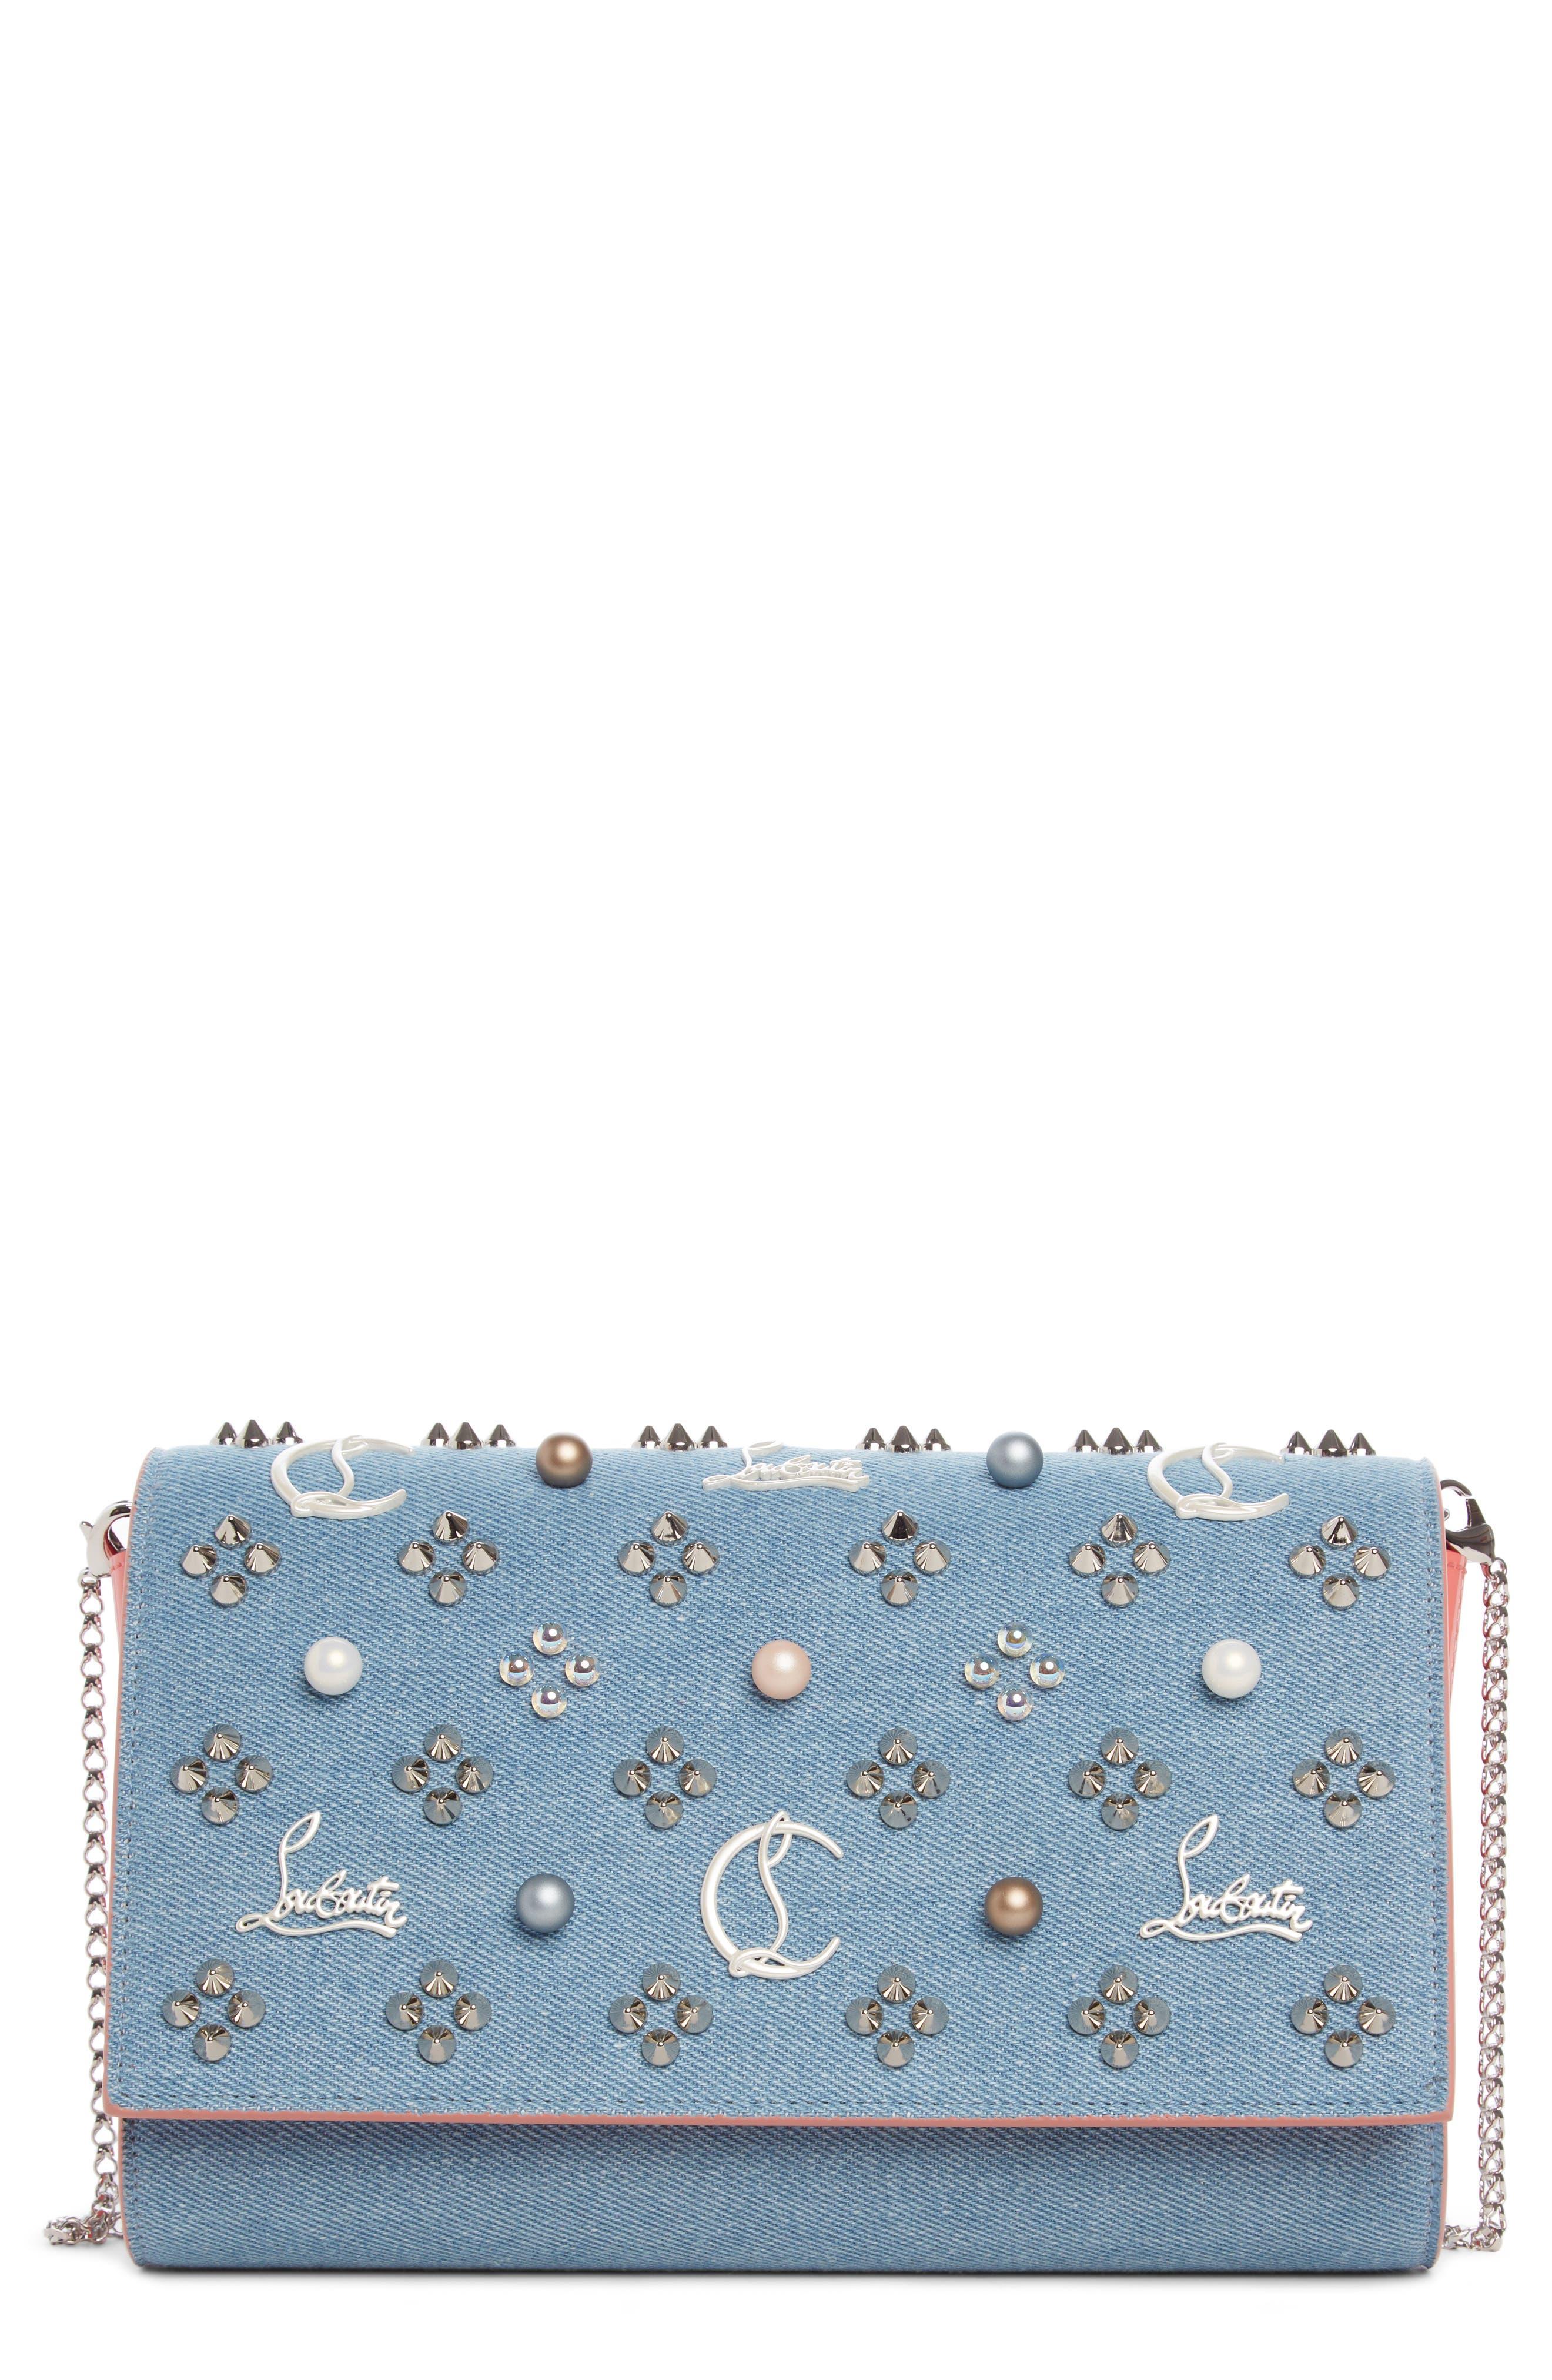 Paloma Studded Denim Clutch,                             Main thumbnail 1, color,                             BLUE/ PEARL MIX